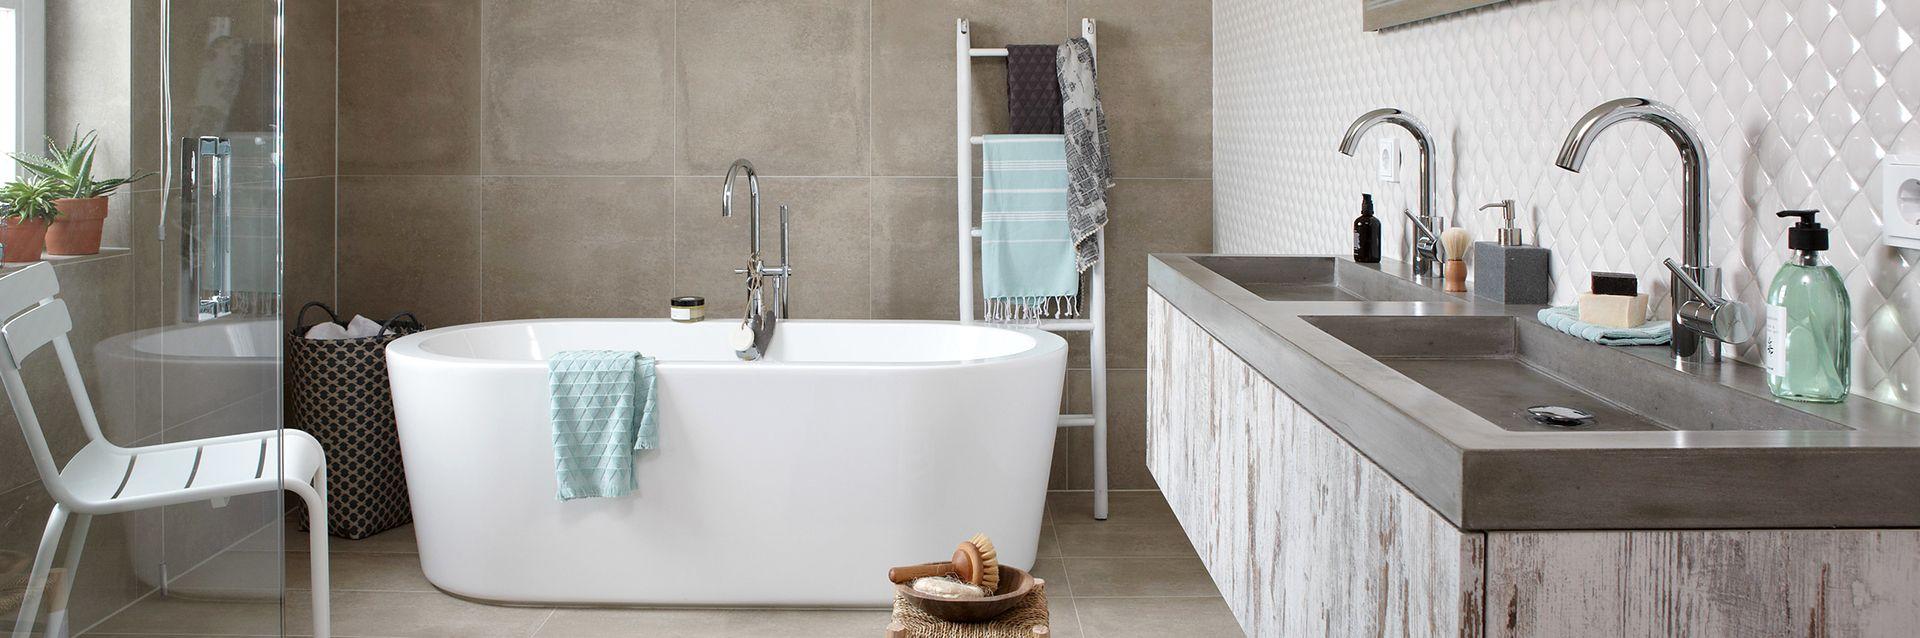 Landelijke badkamer - Landelijke badkamer